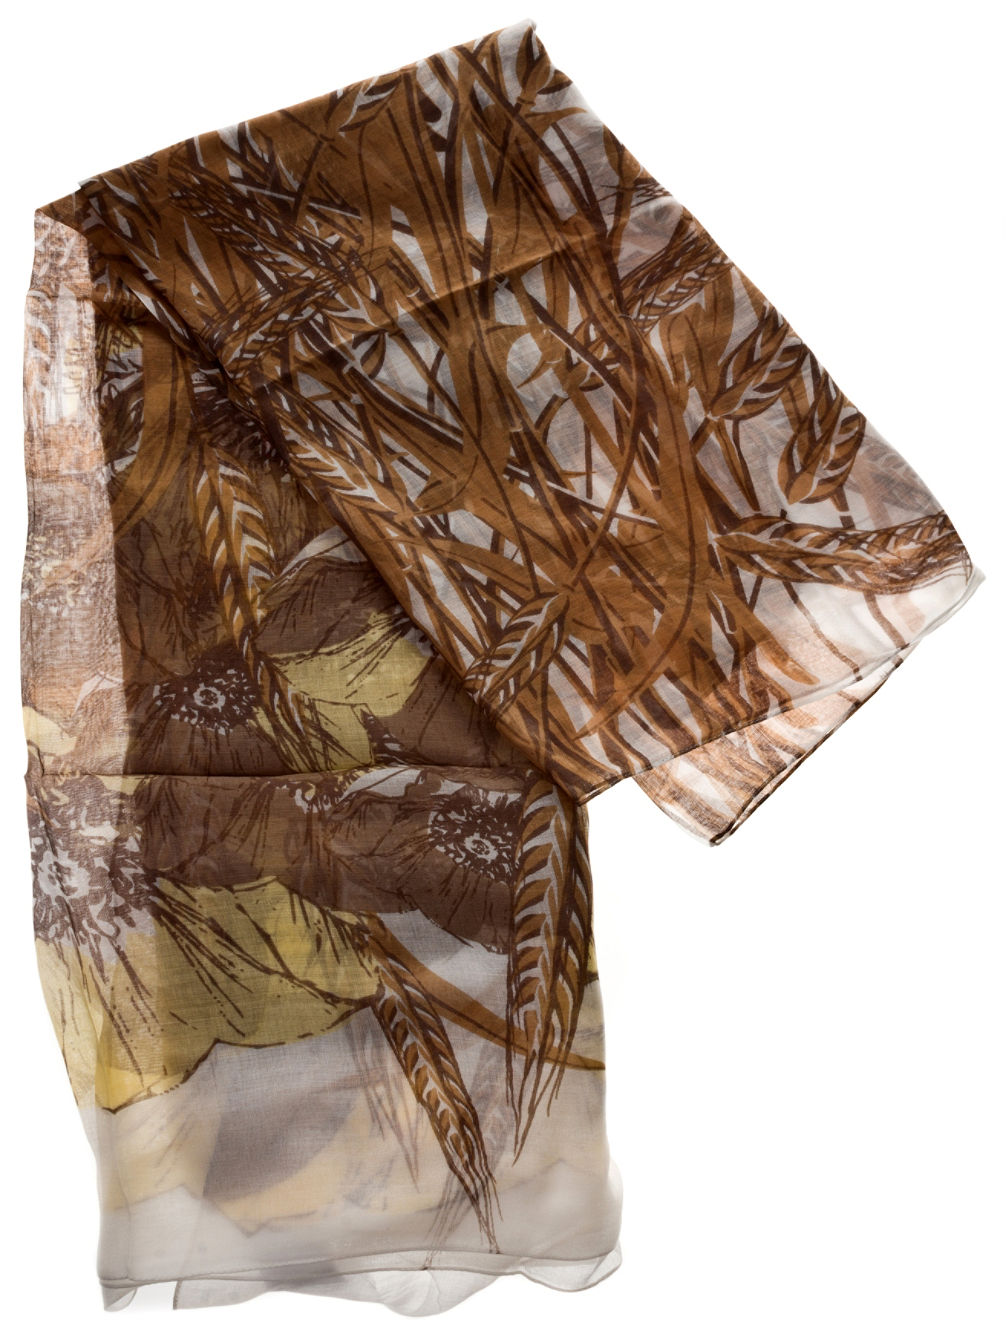 hueftgold-pole-scarf